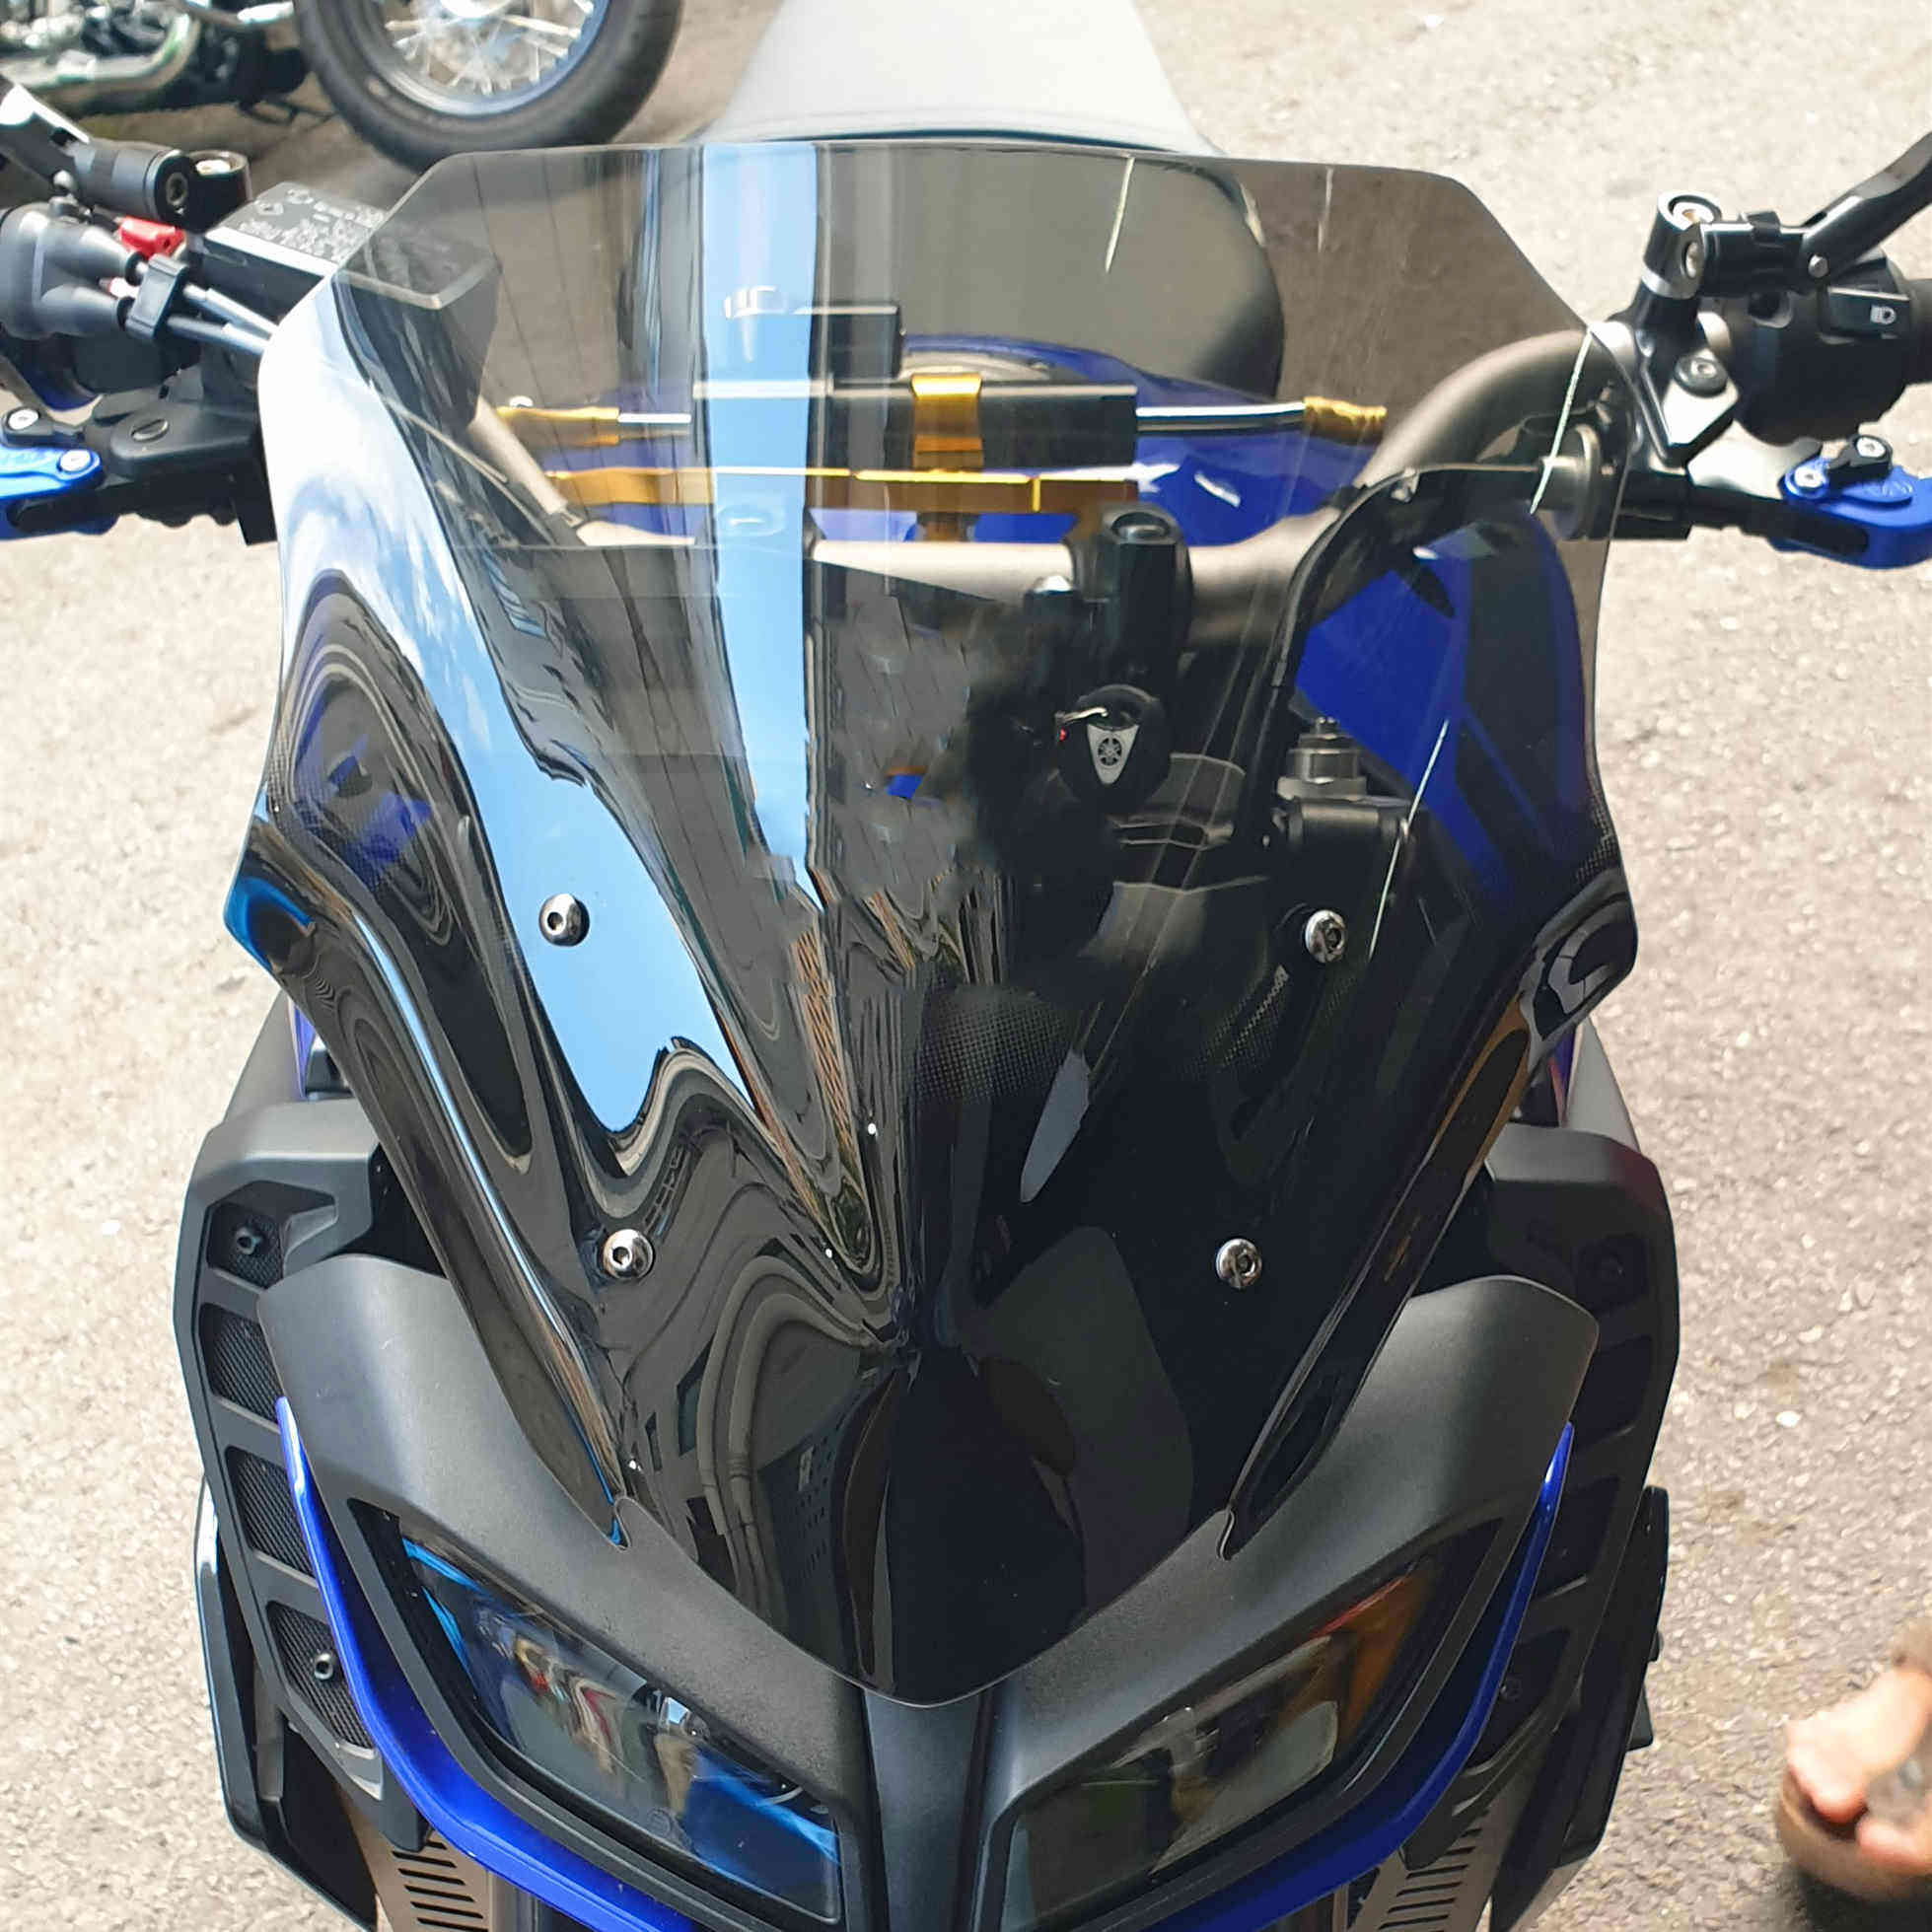 XuBa Motorbike Windshield Windscreen For Yamaha MT09 MT-09 FZ09 FZ-09 2017 2018 black